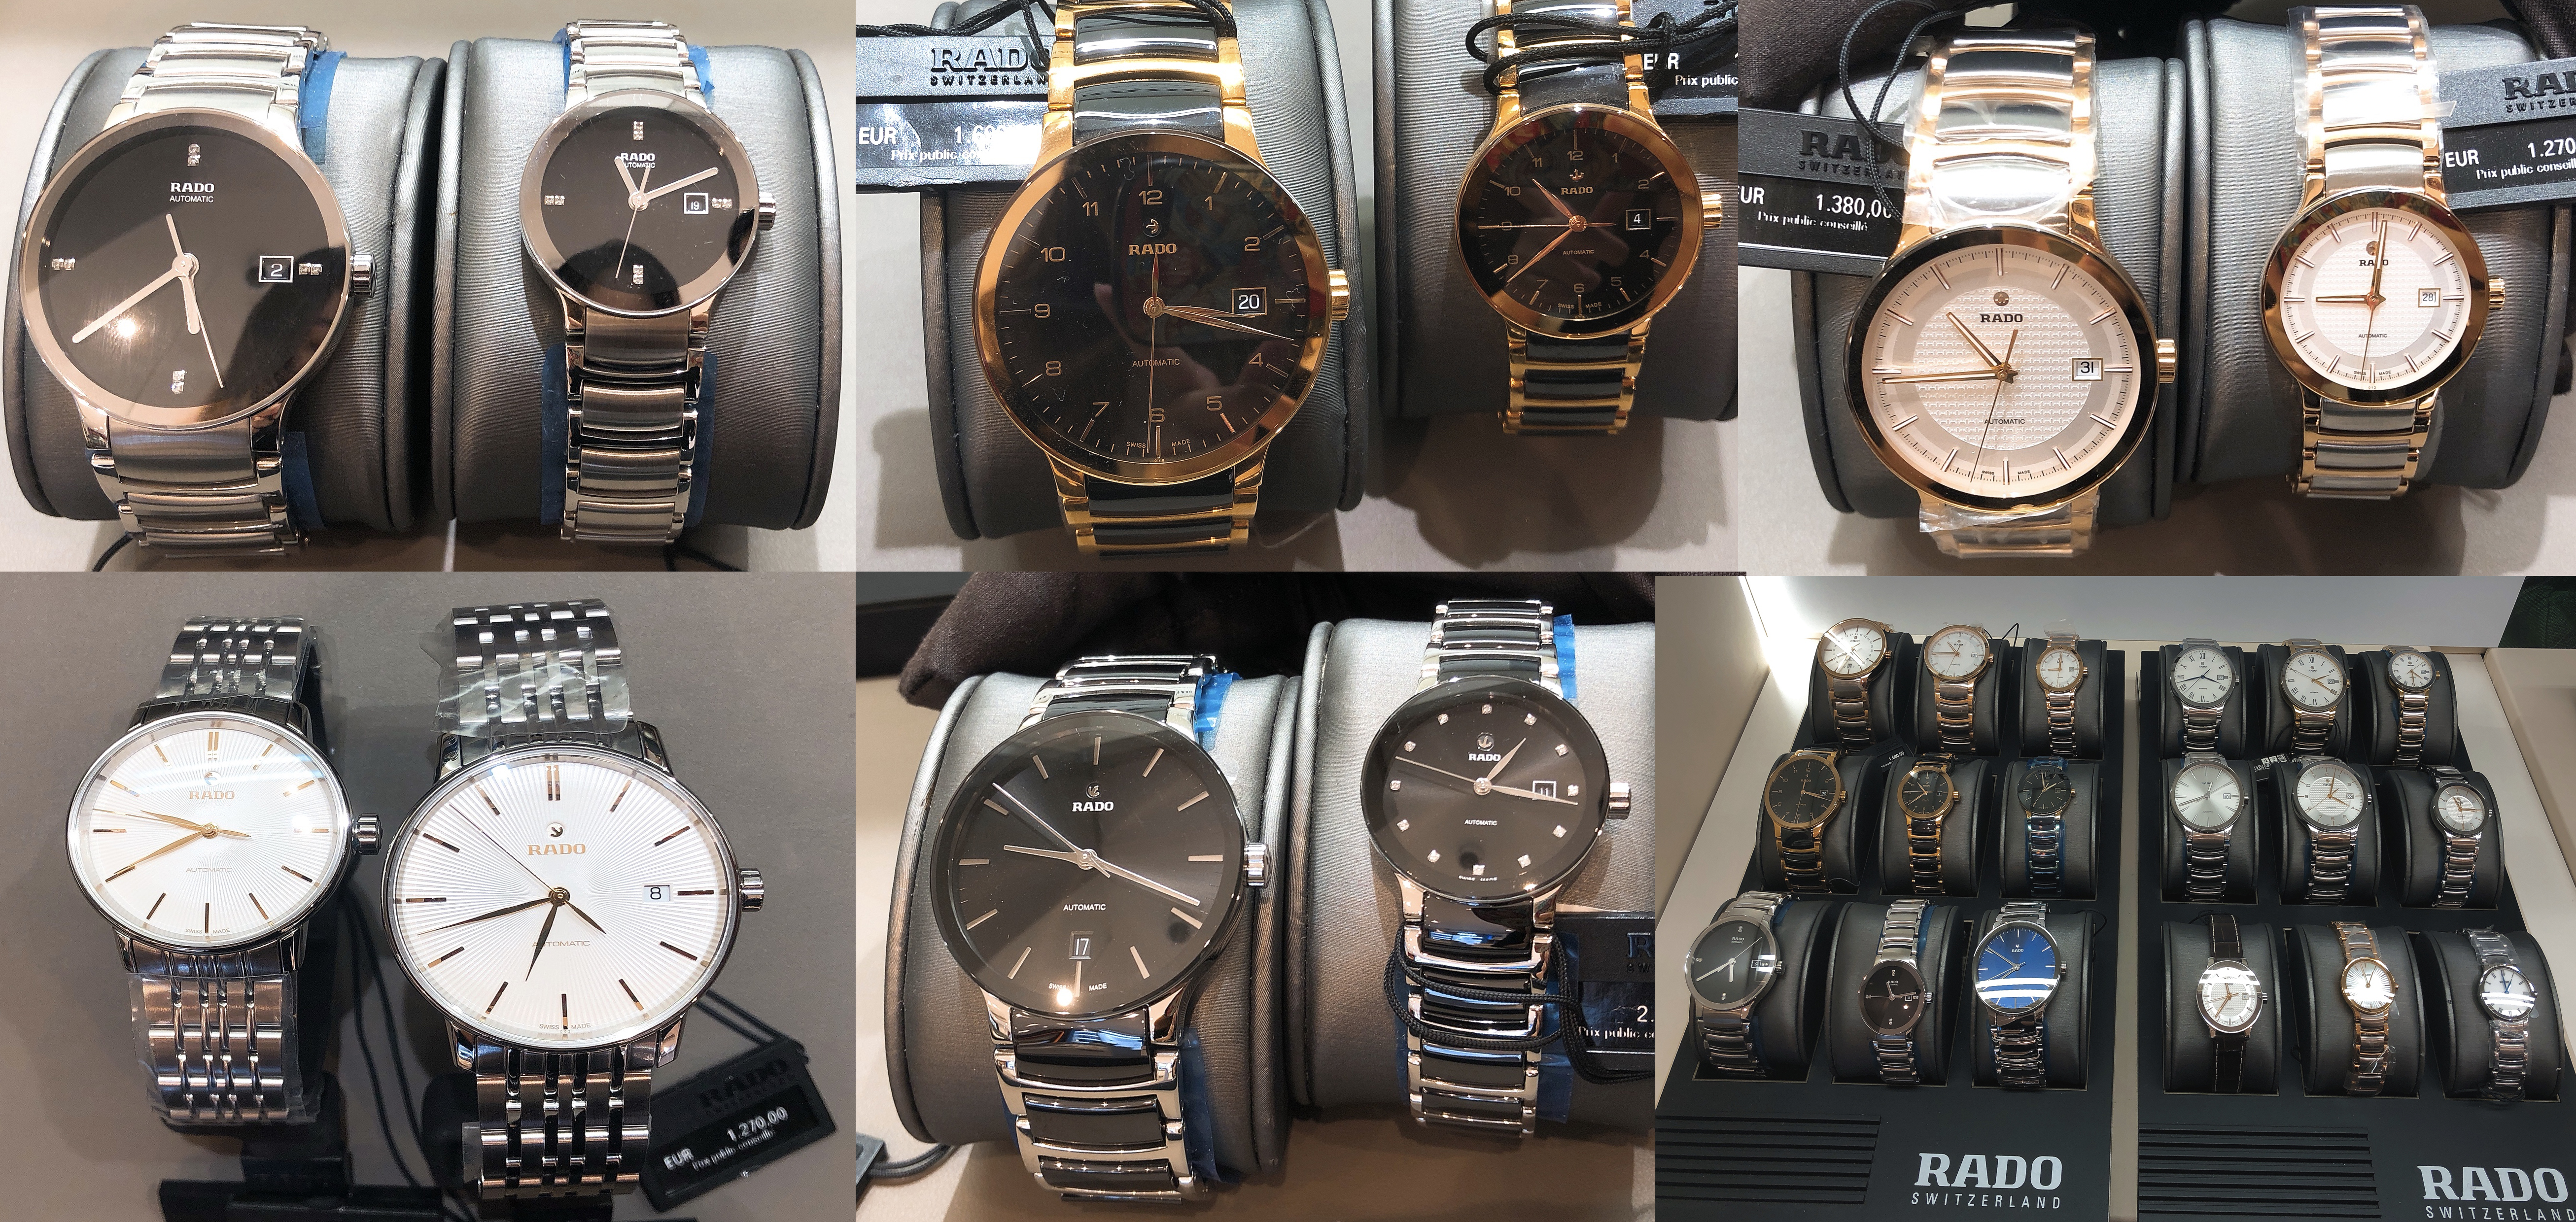 巴黎rado手表